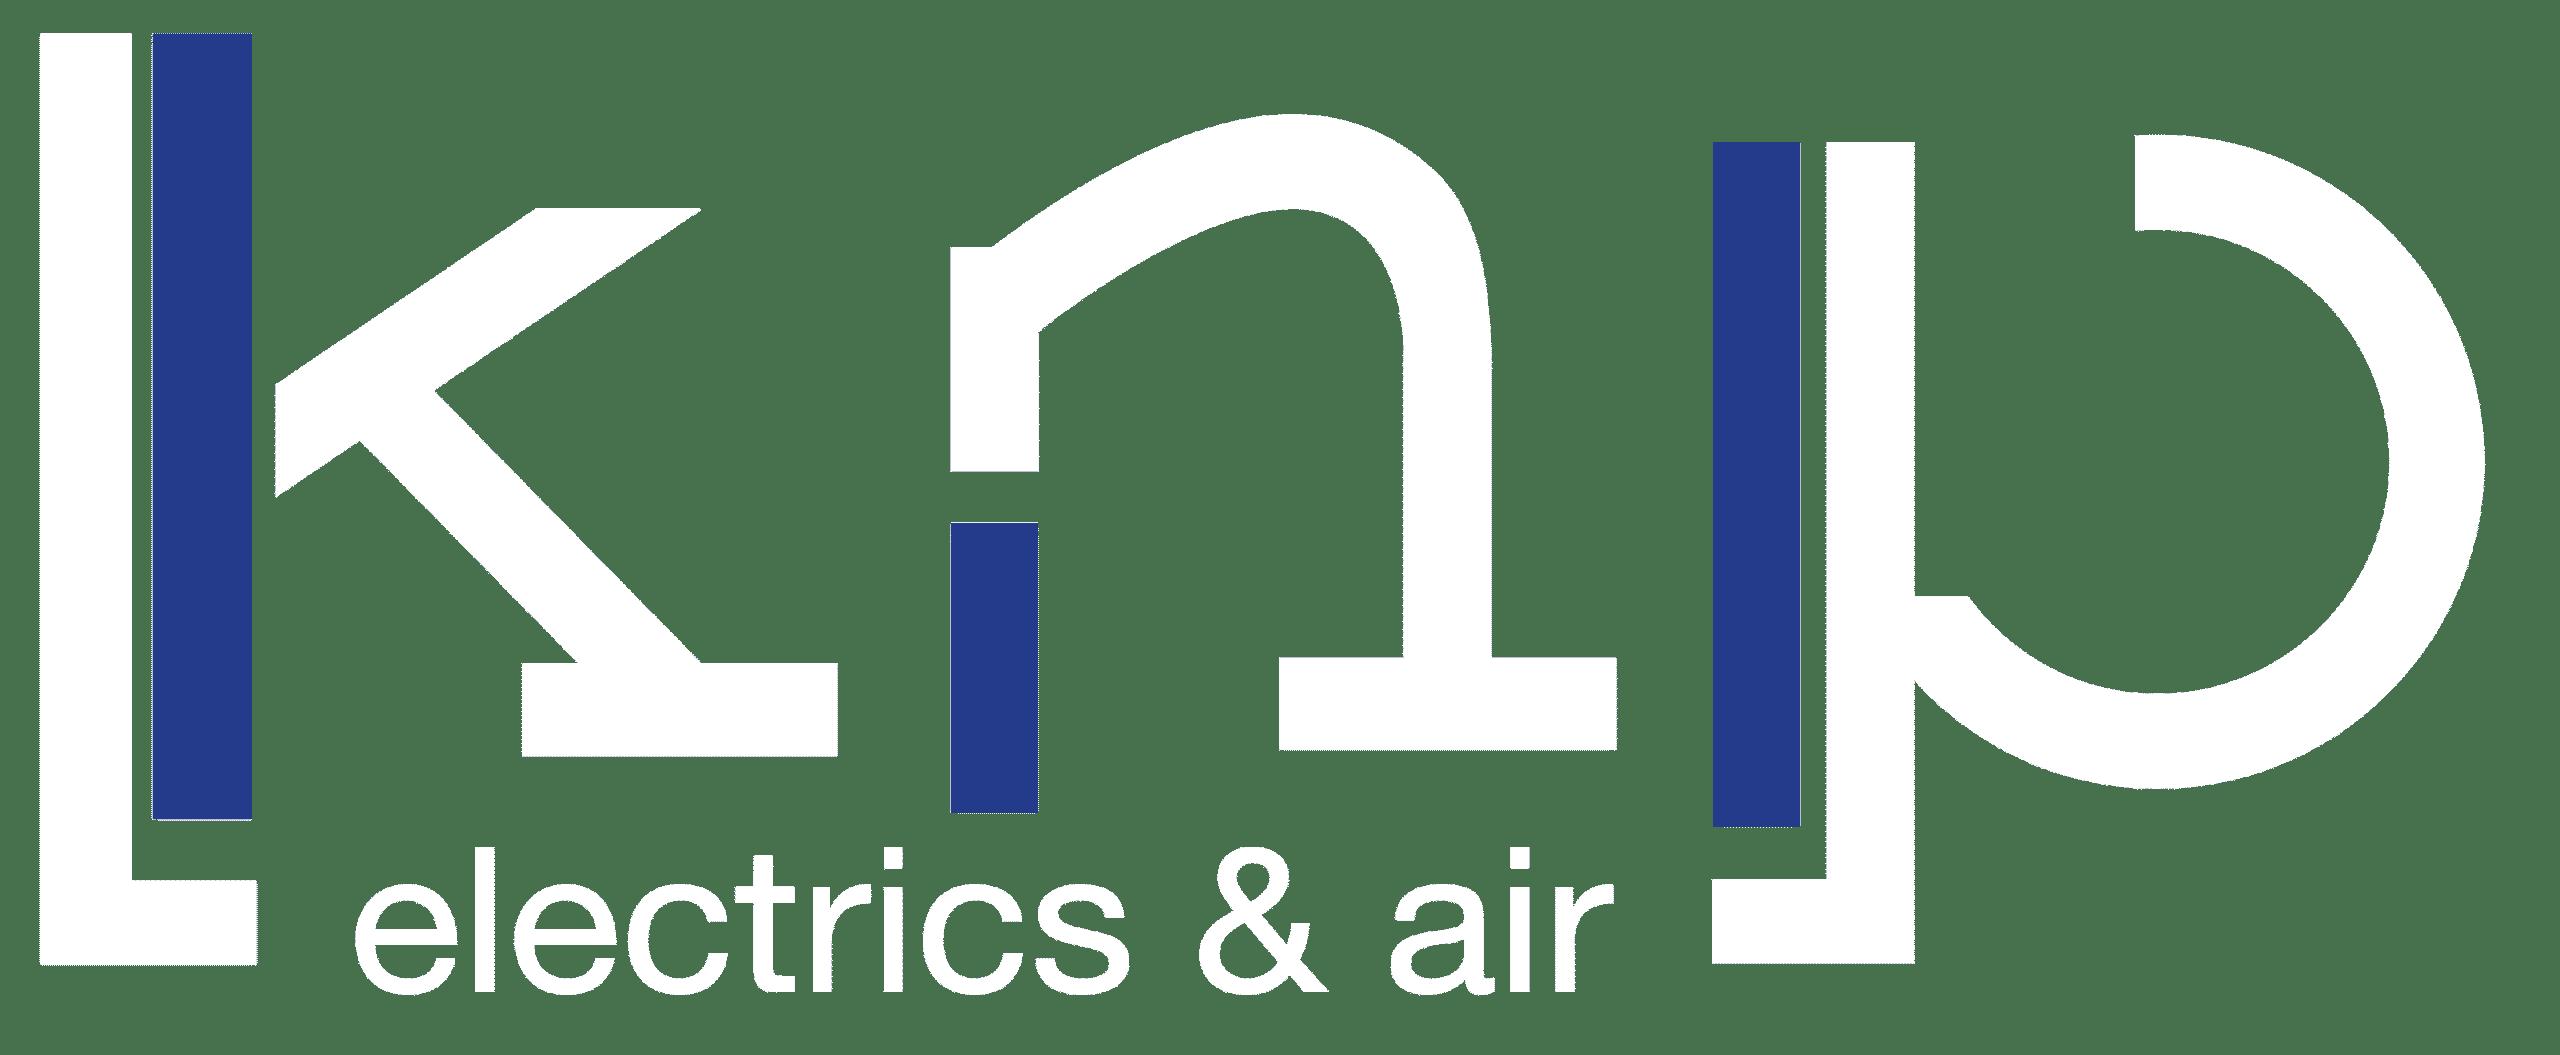 KnP logo